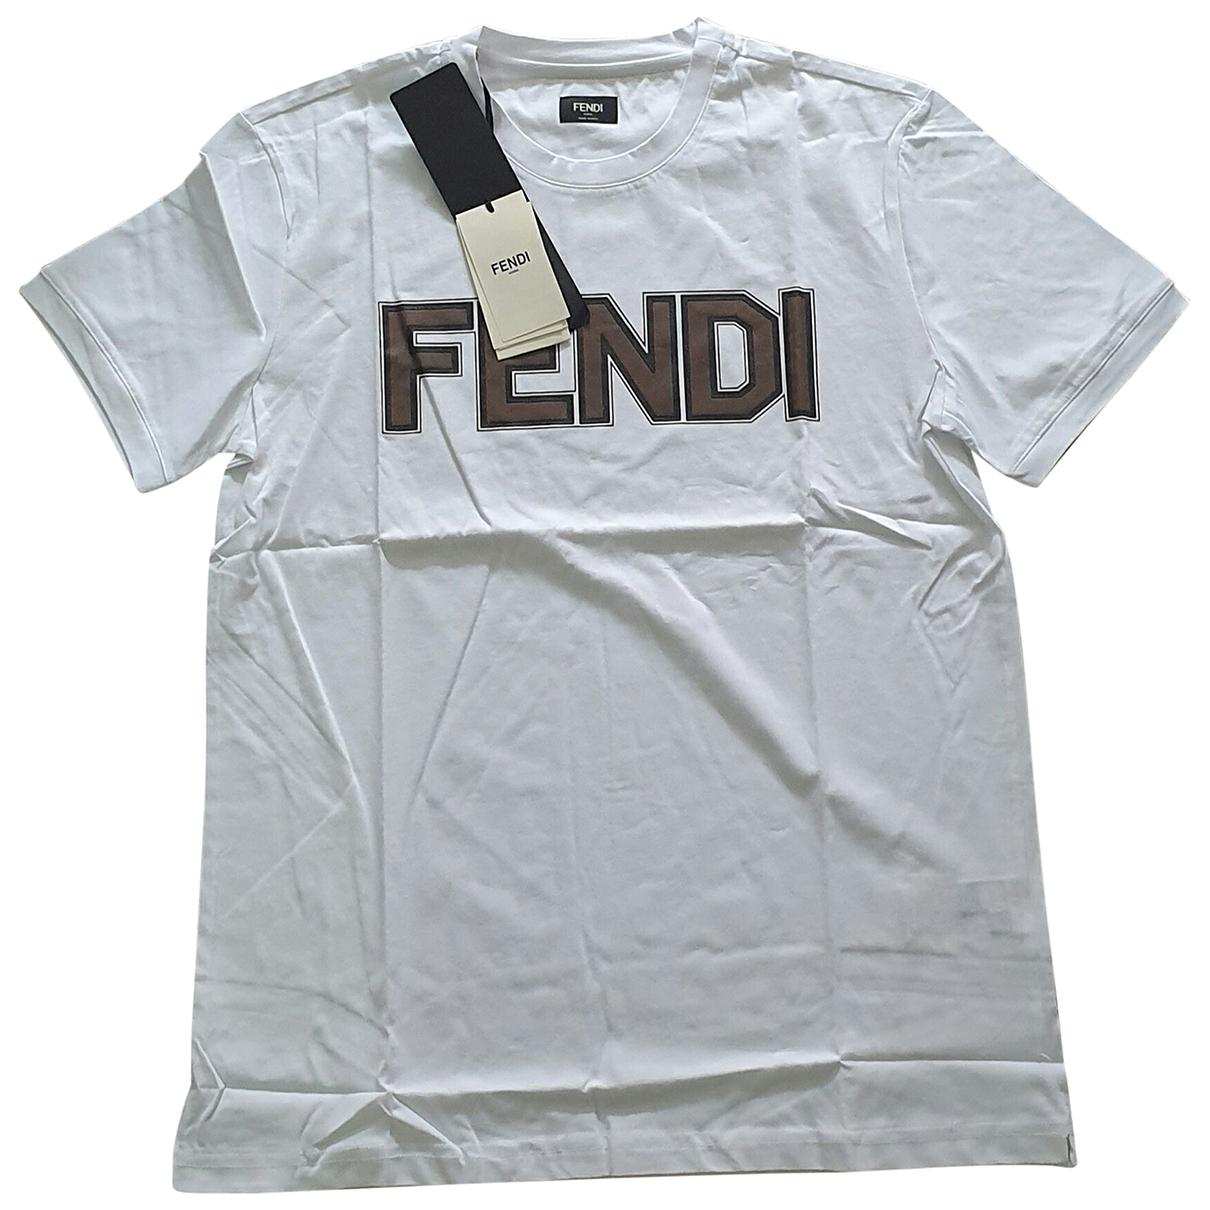 Fendi \N T-Shirts in  Weiss Baumwolle